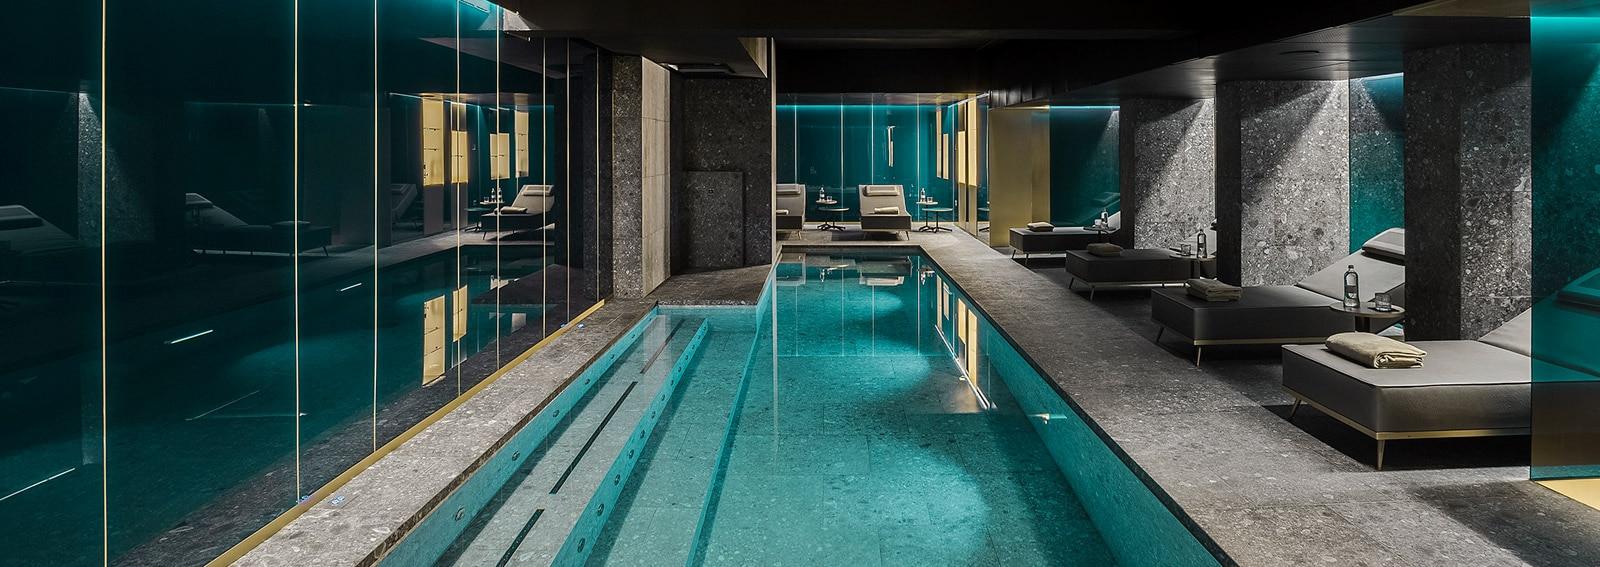 ceresio-7-piscina-desktop